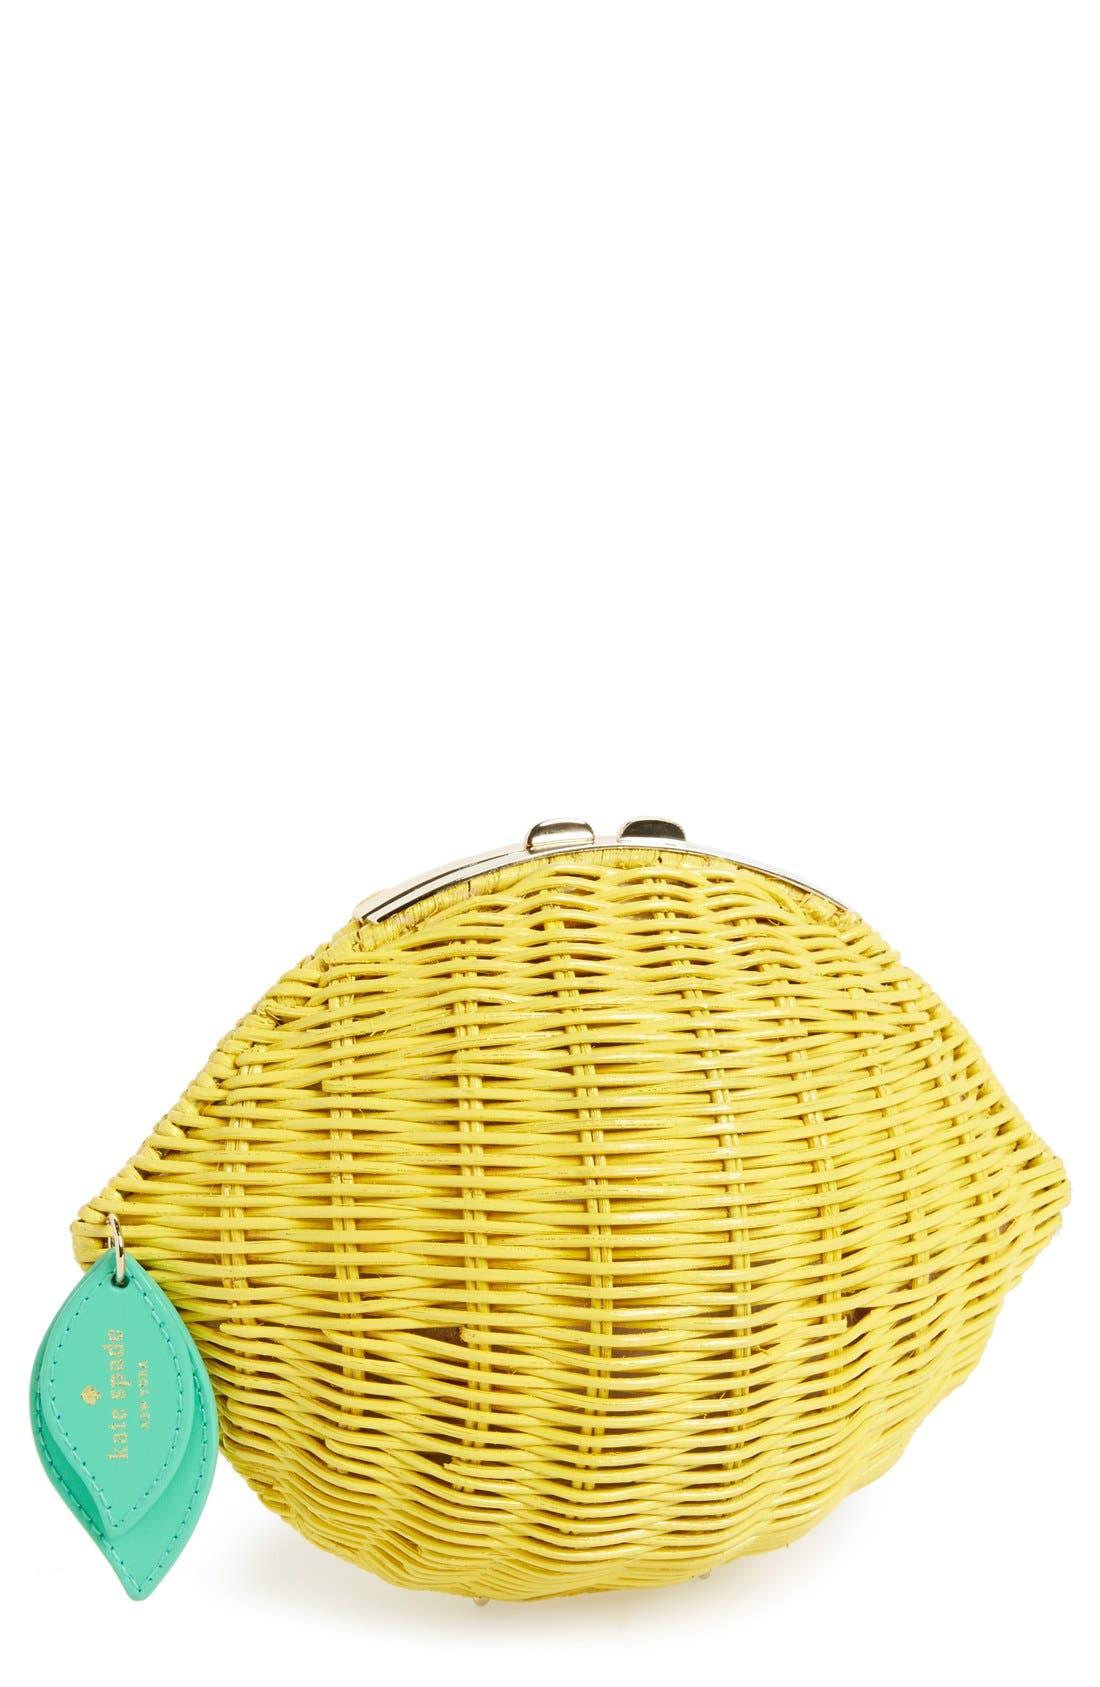 Alternate Image 1 Selected - kate spade new york 'vita riva' wicker lemon crossbody bag